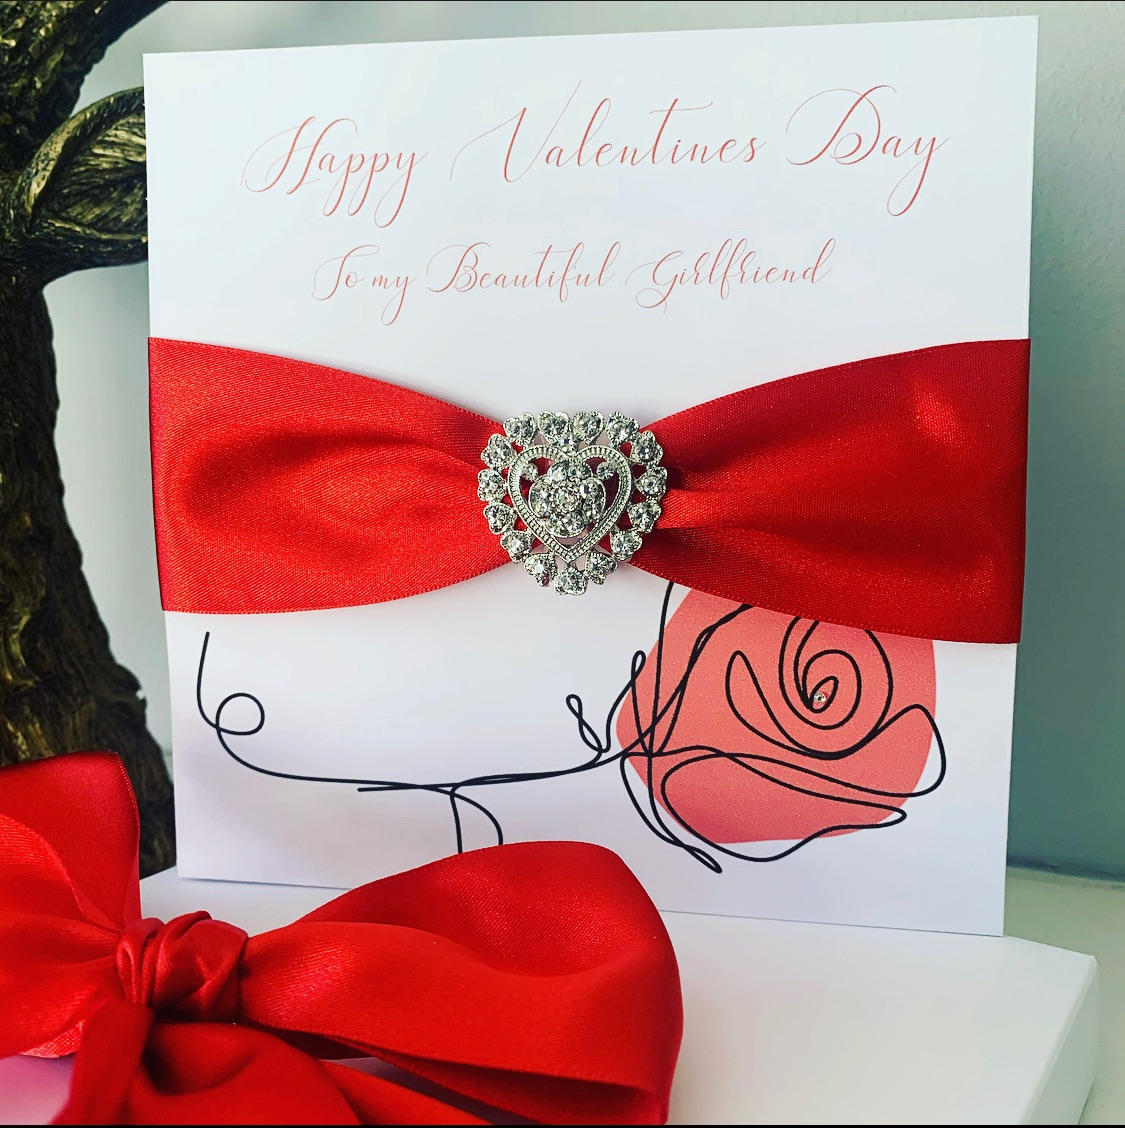 Luxury Valentines Day cards